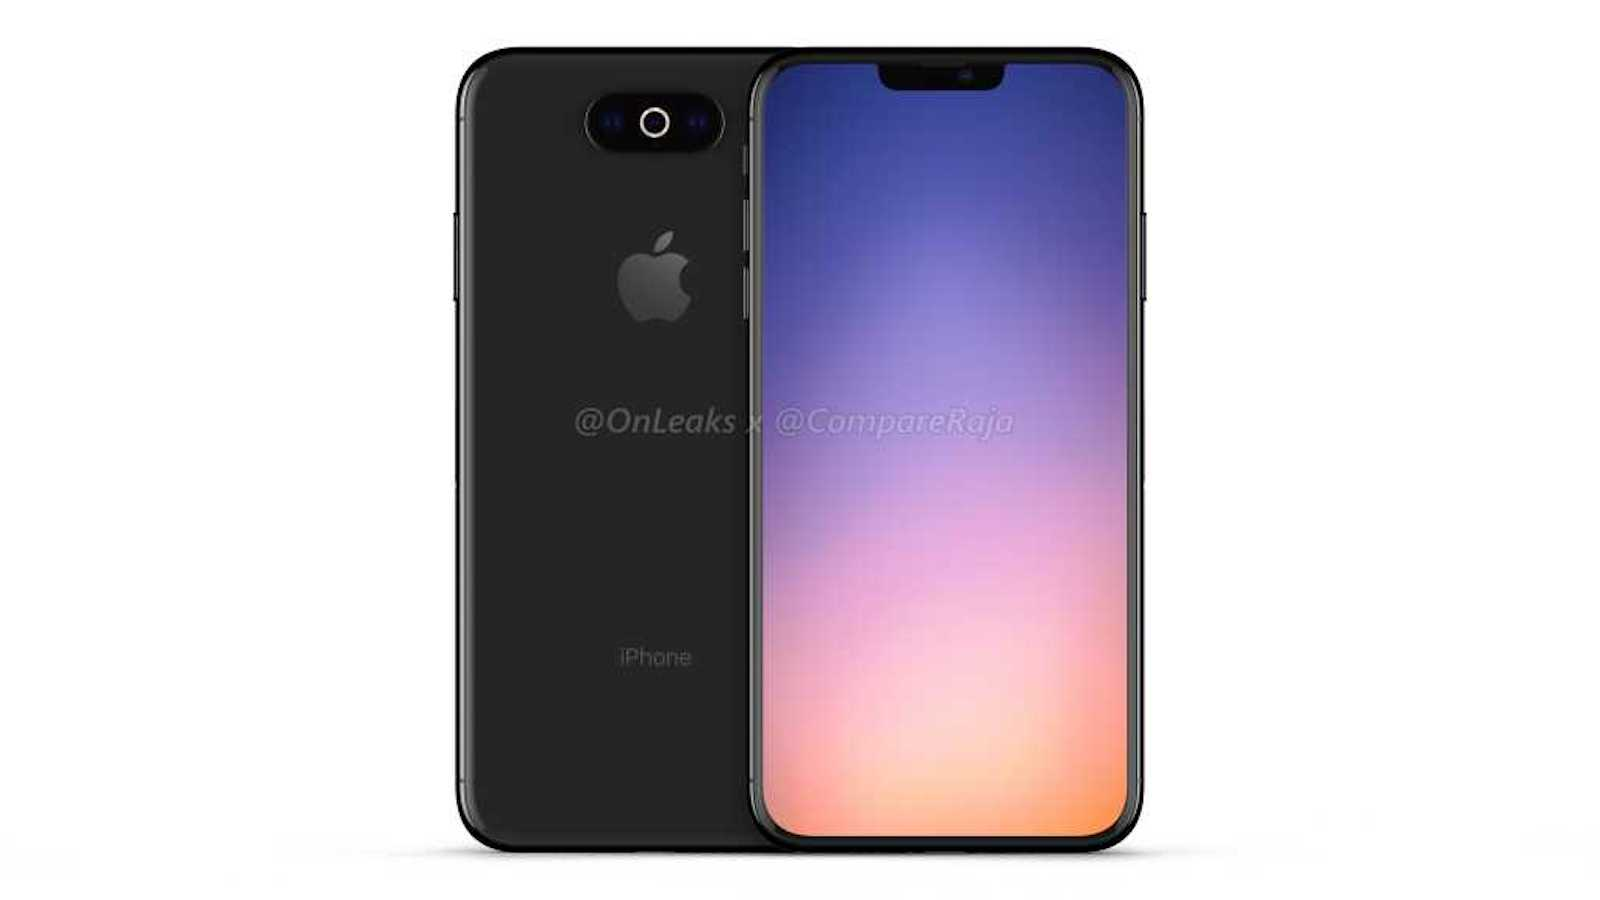 iphone-11-2019-dual-camera-design-1.jpg